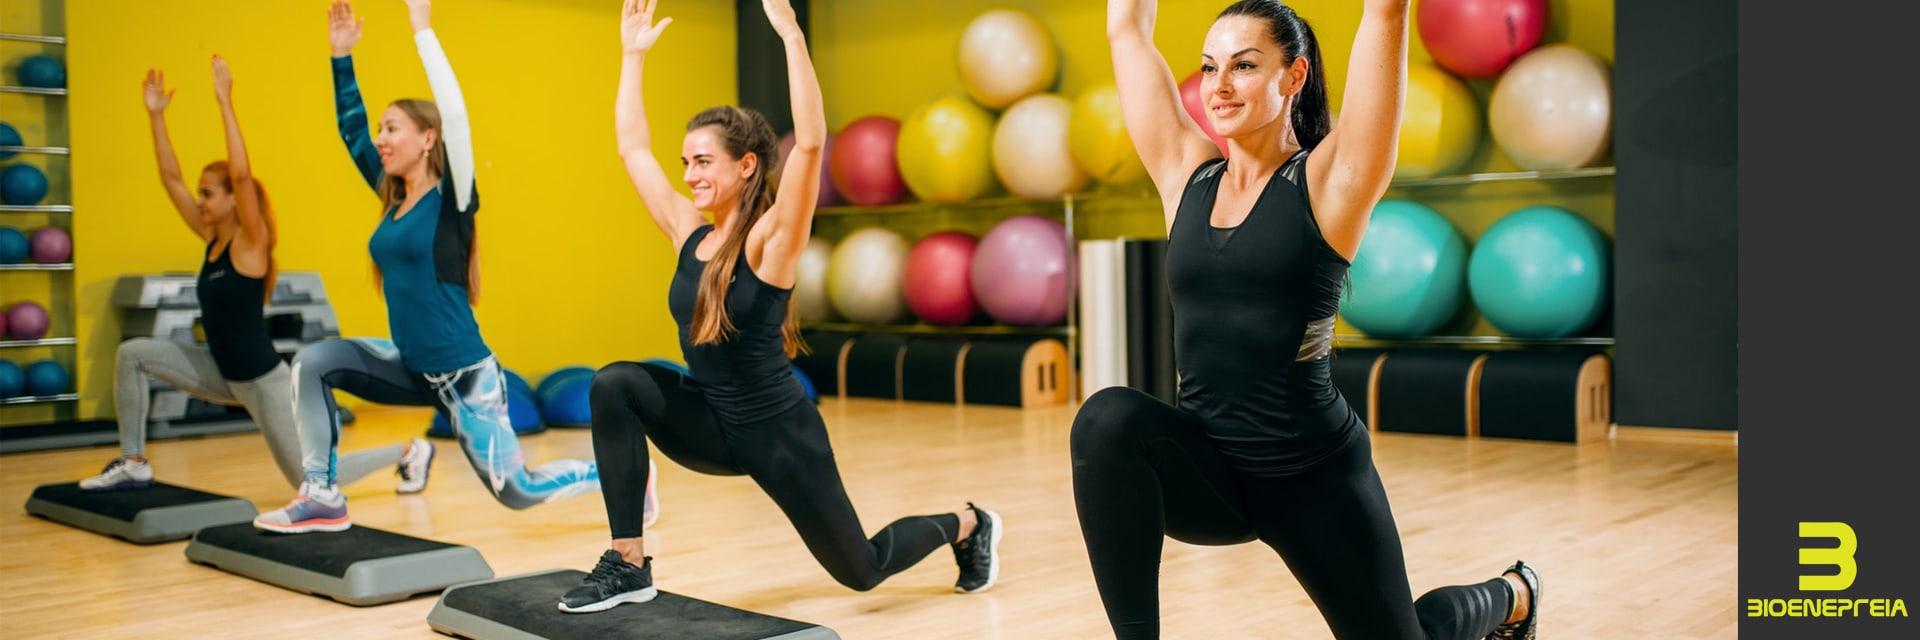 step-bioenergia-fc-gym-sparti